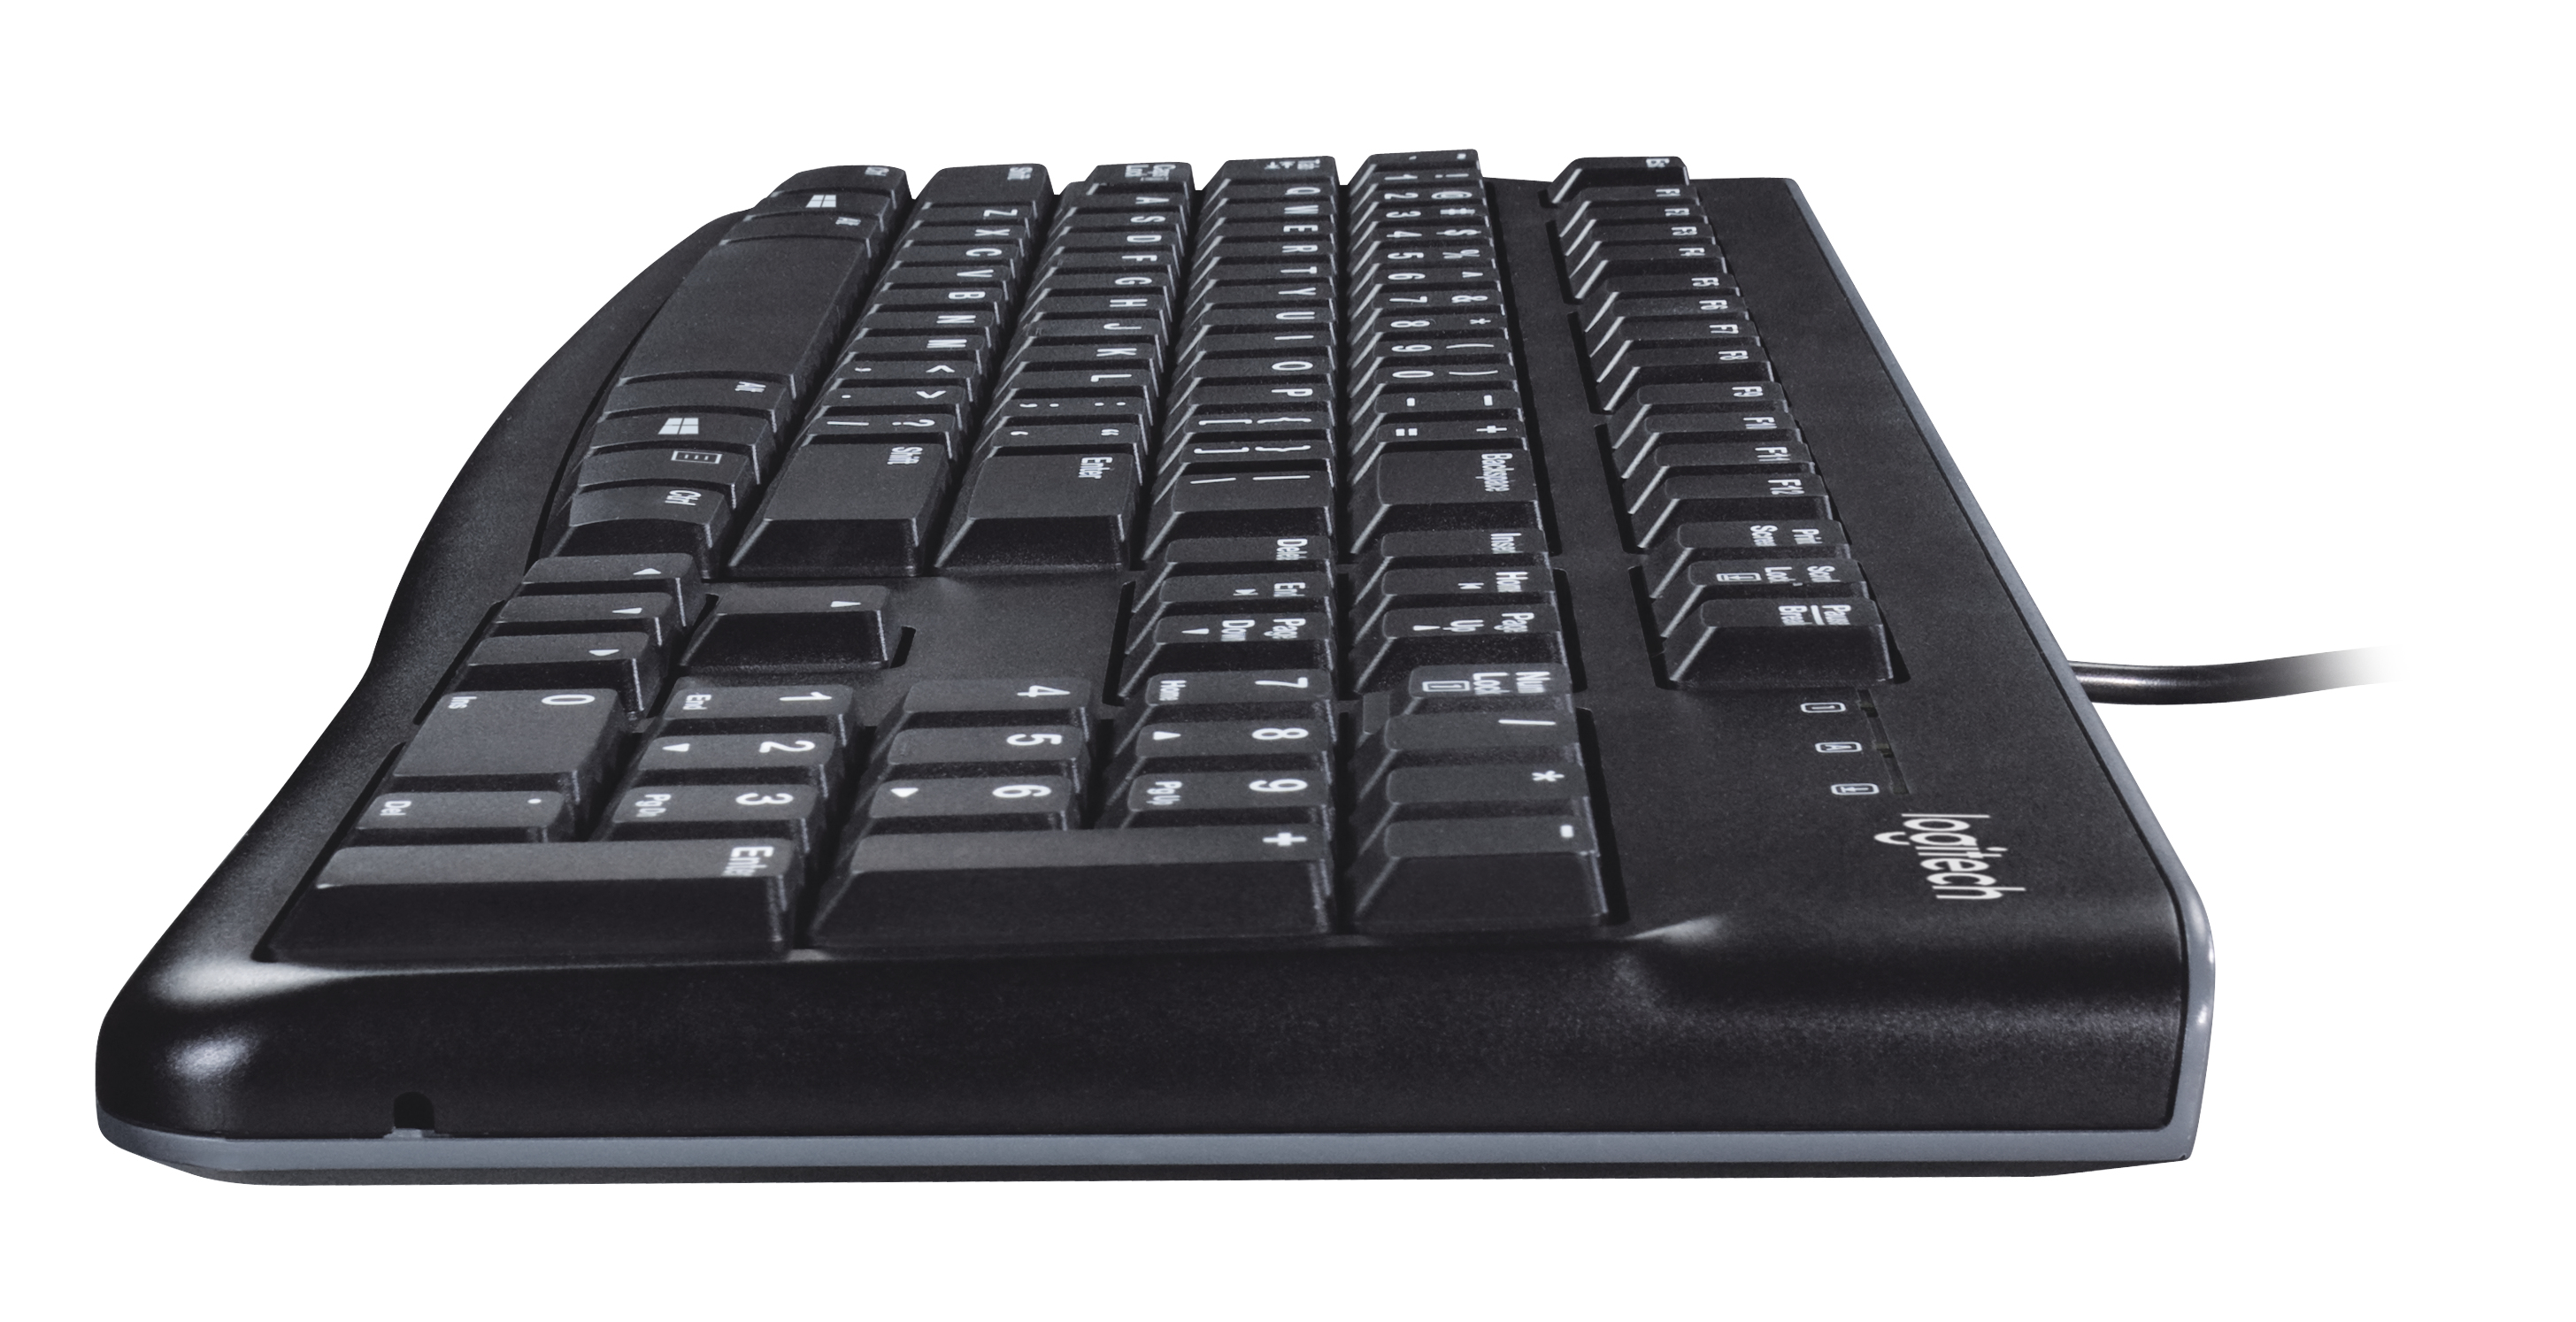 K120 Keyboard (USB)